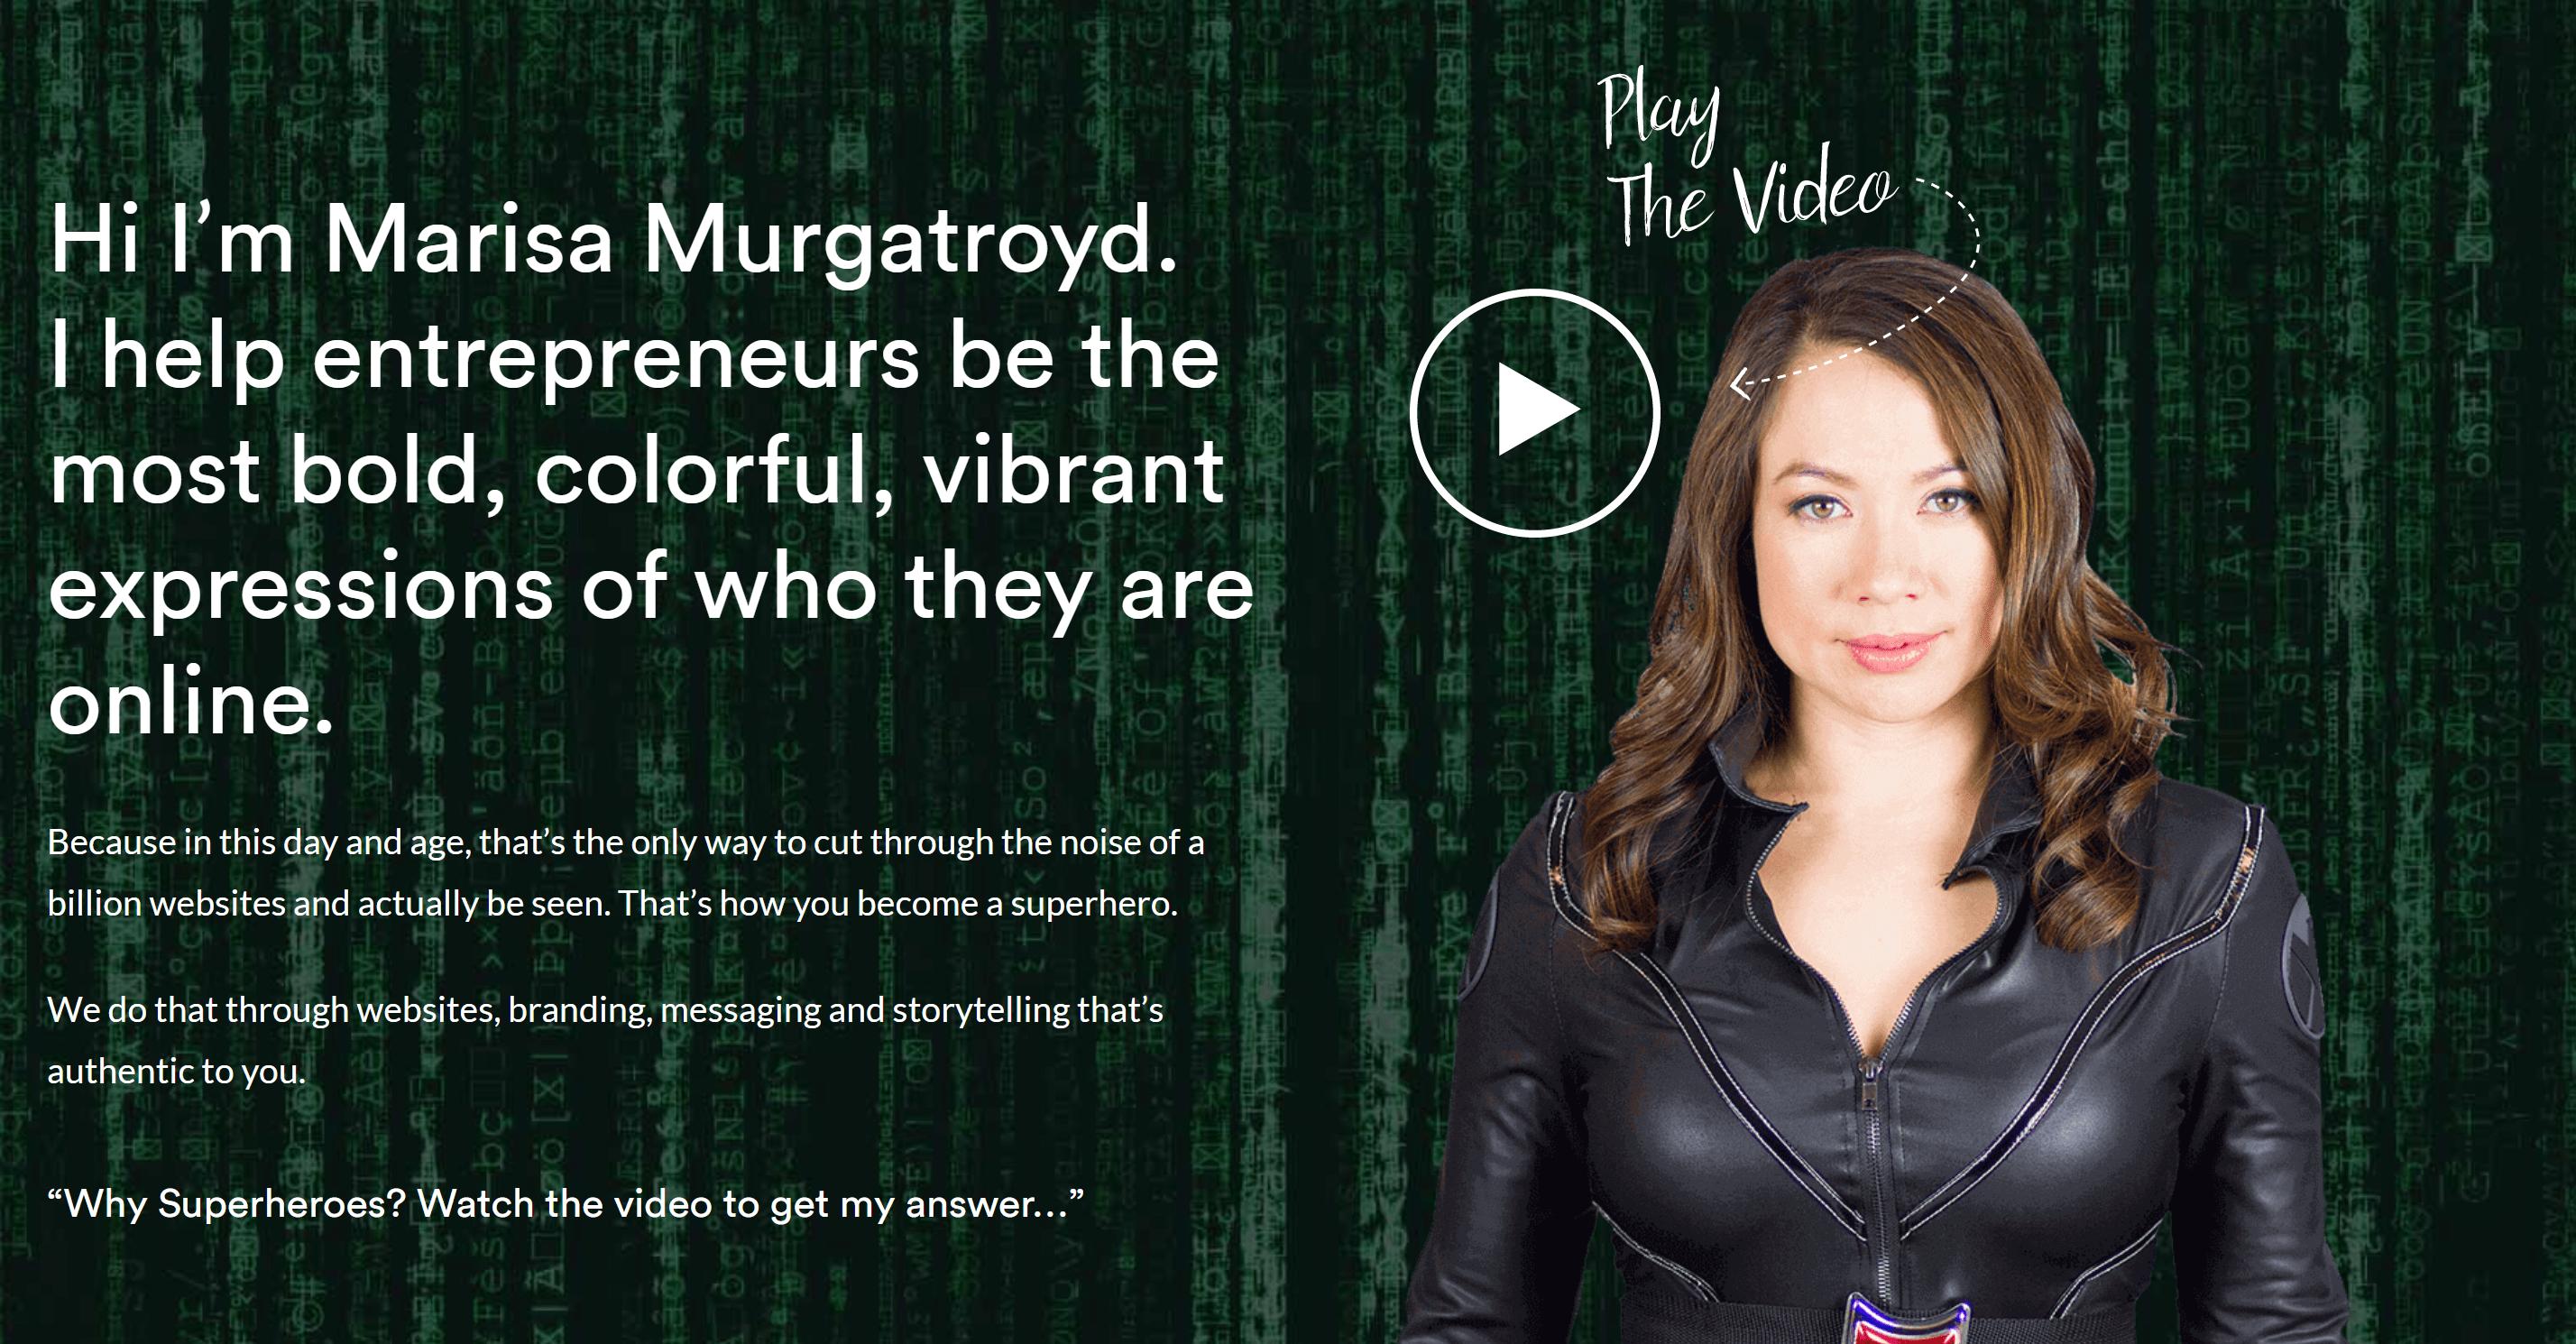 Marisa Murgatroyd EPM Online Customer Testimonials & Reviews